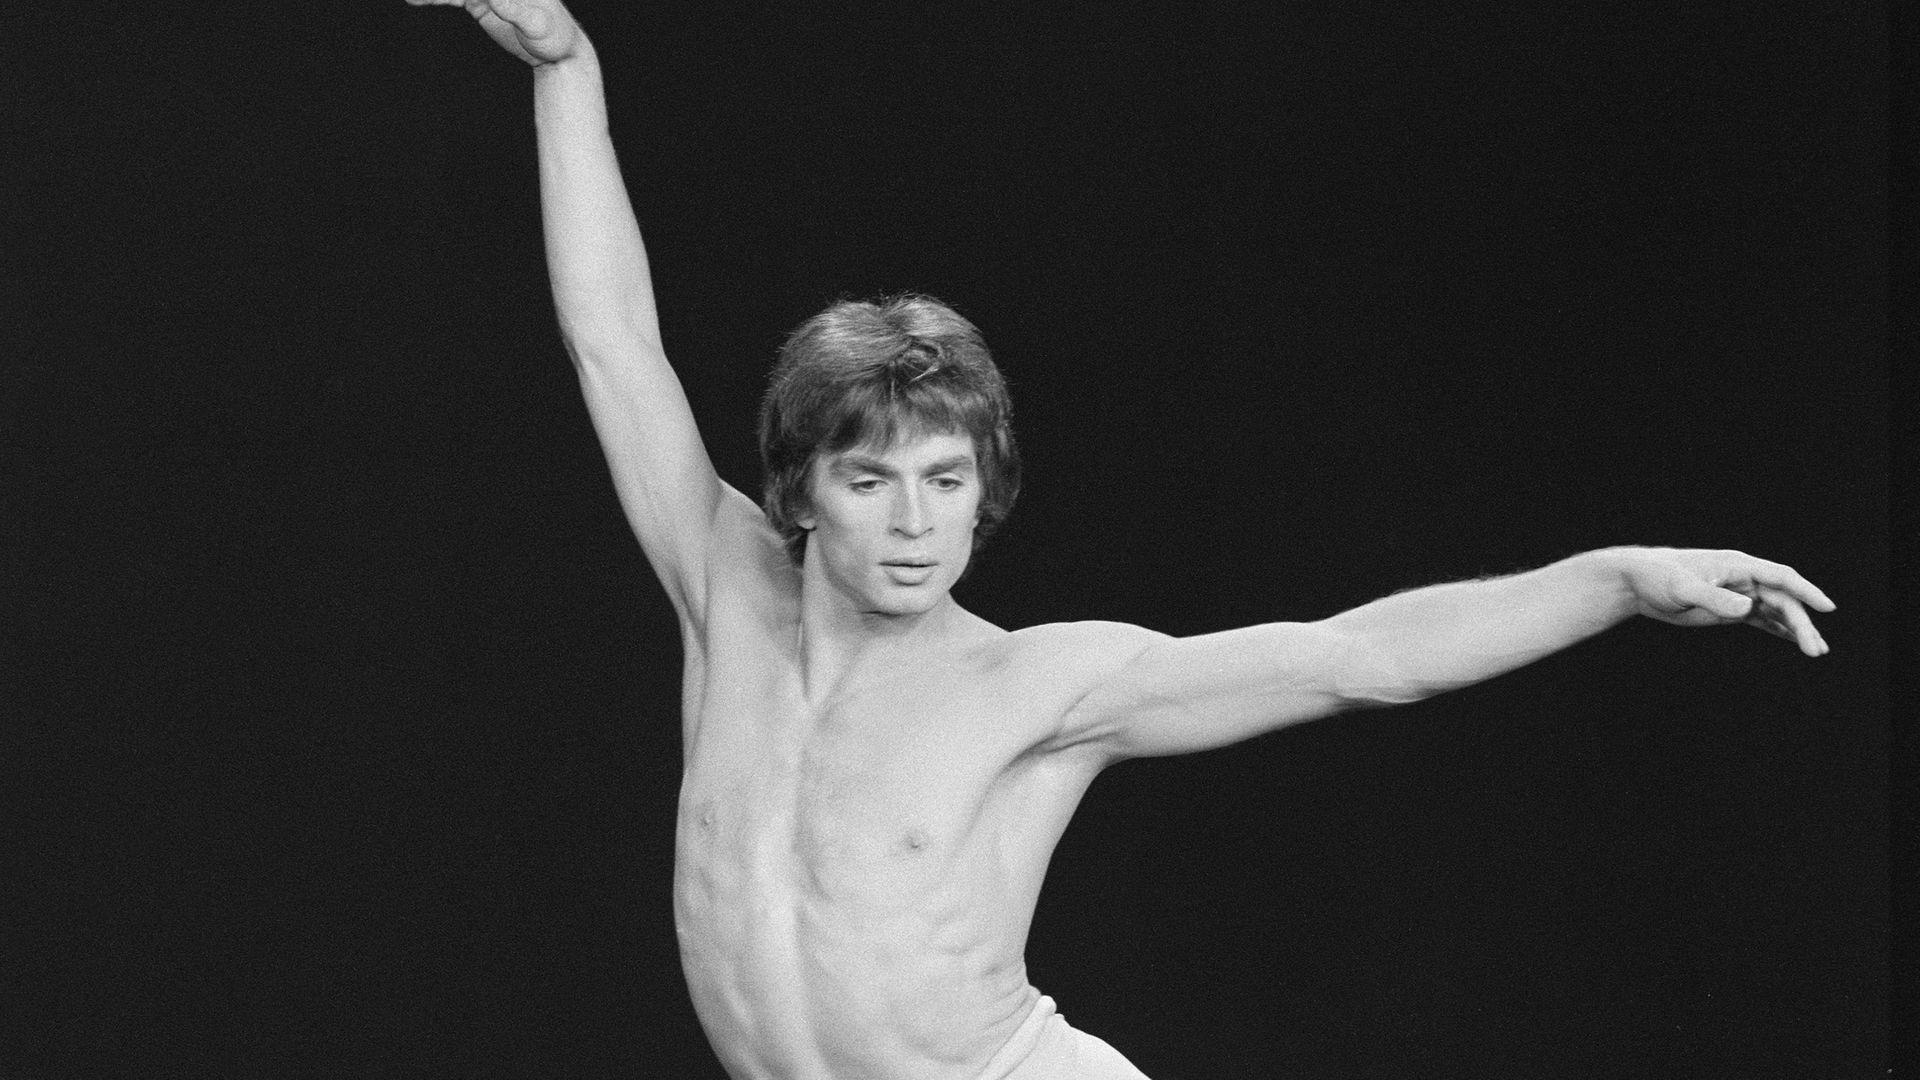 The dancer Rudolf Nureyev - Credit: INA via Getty Images